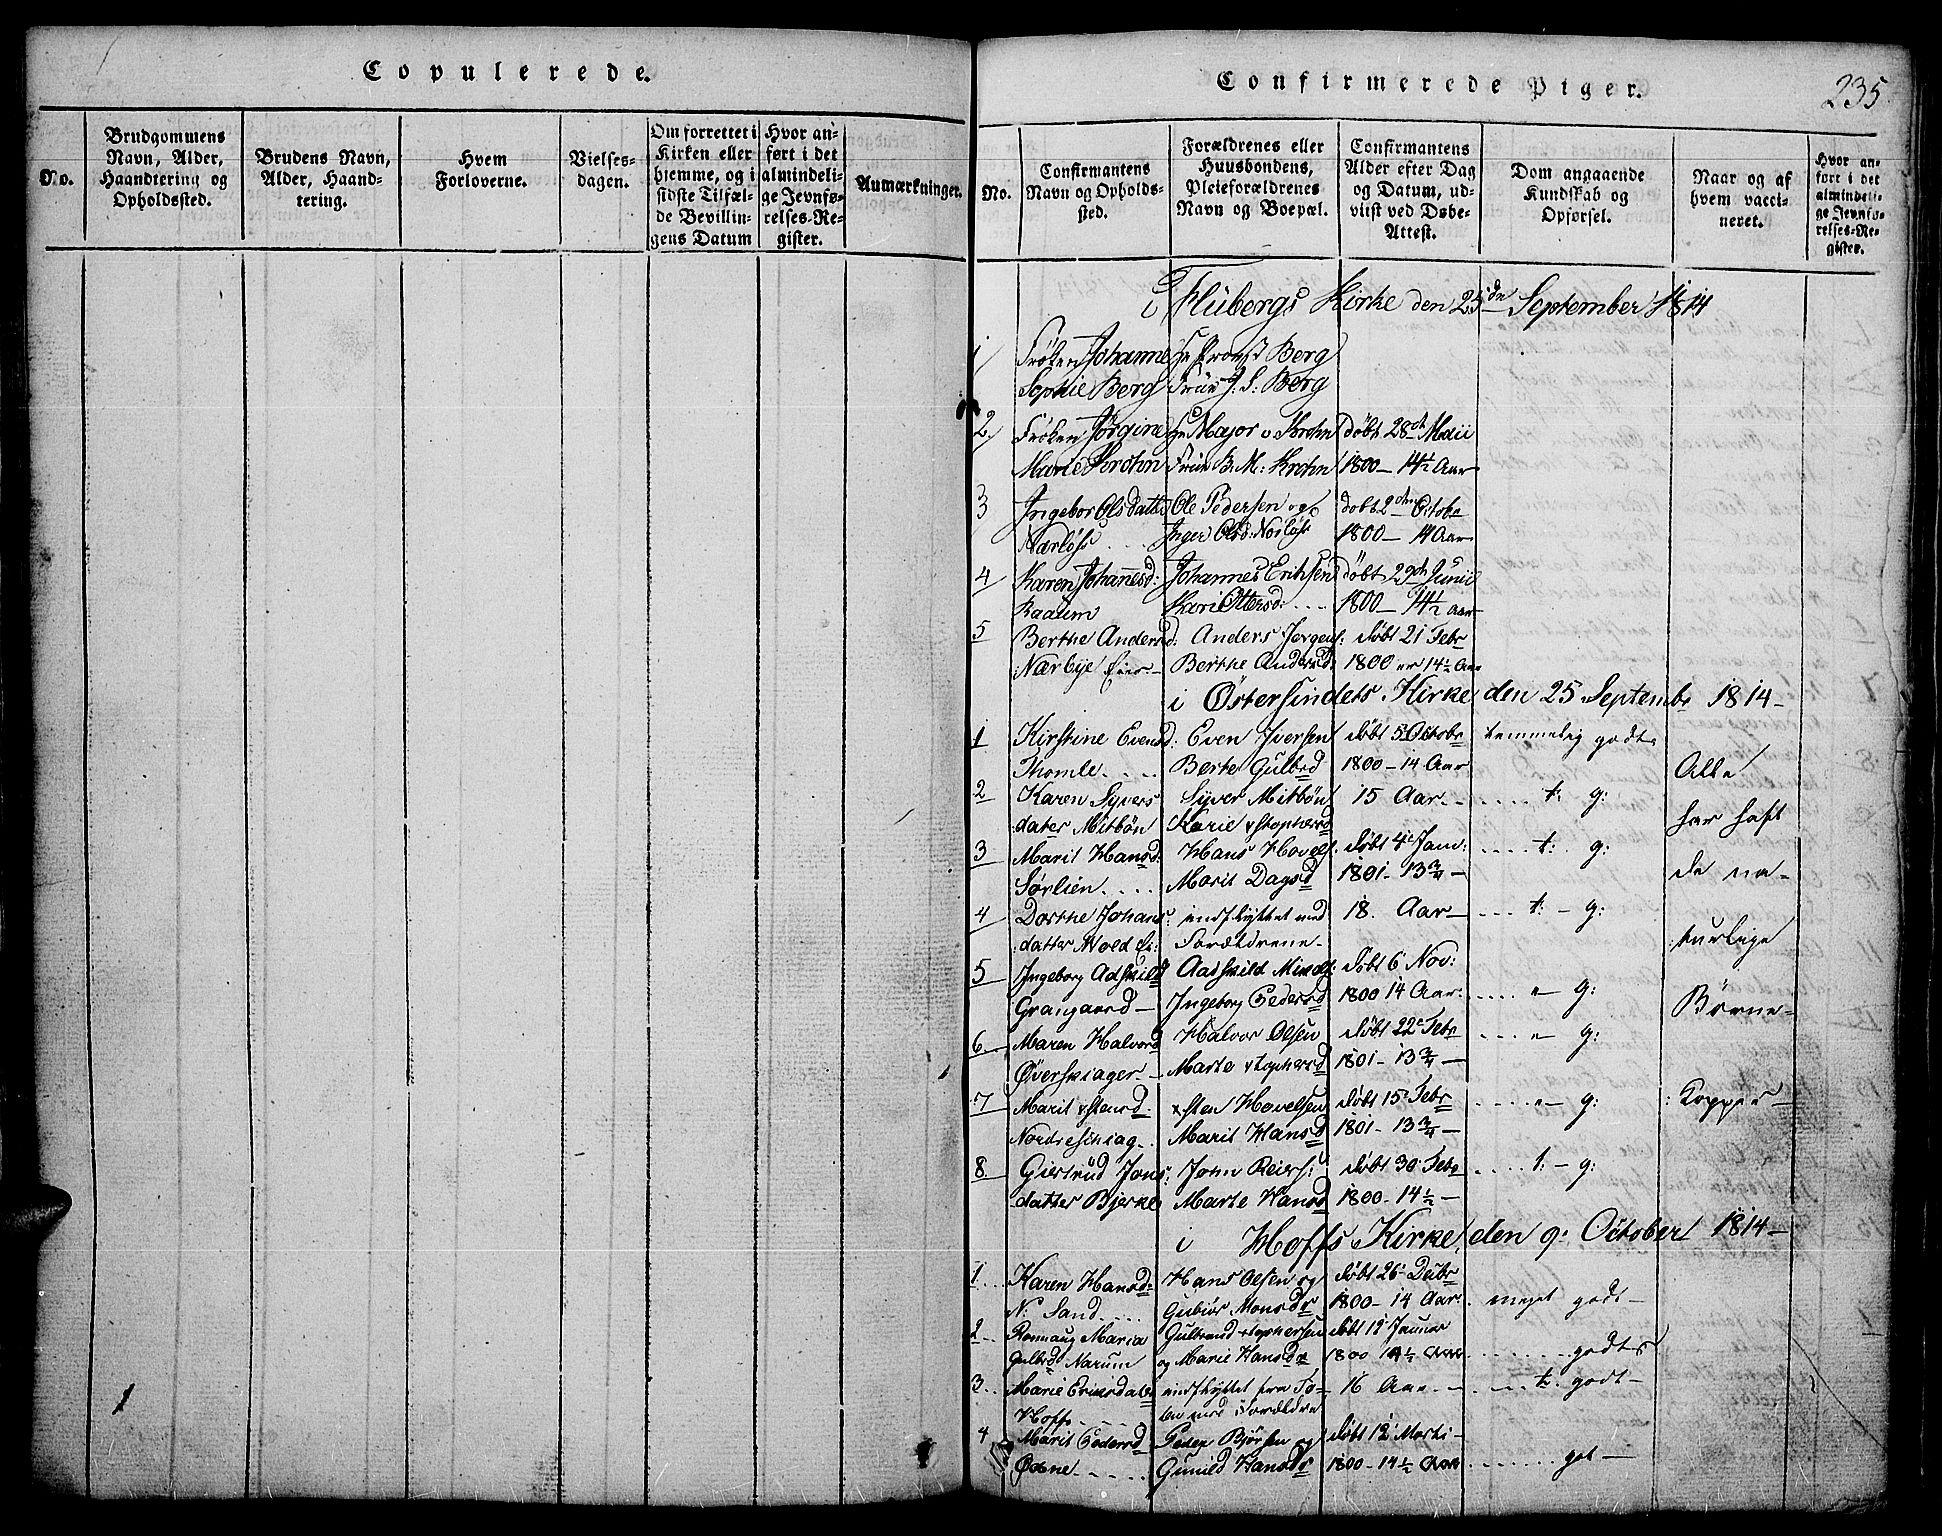 SAH, Land prestekontor, Klokkerbok nr. 1, 1814-1833, s. 235